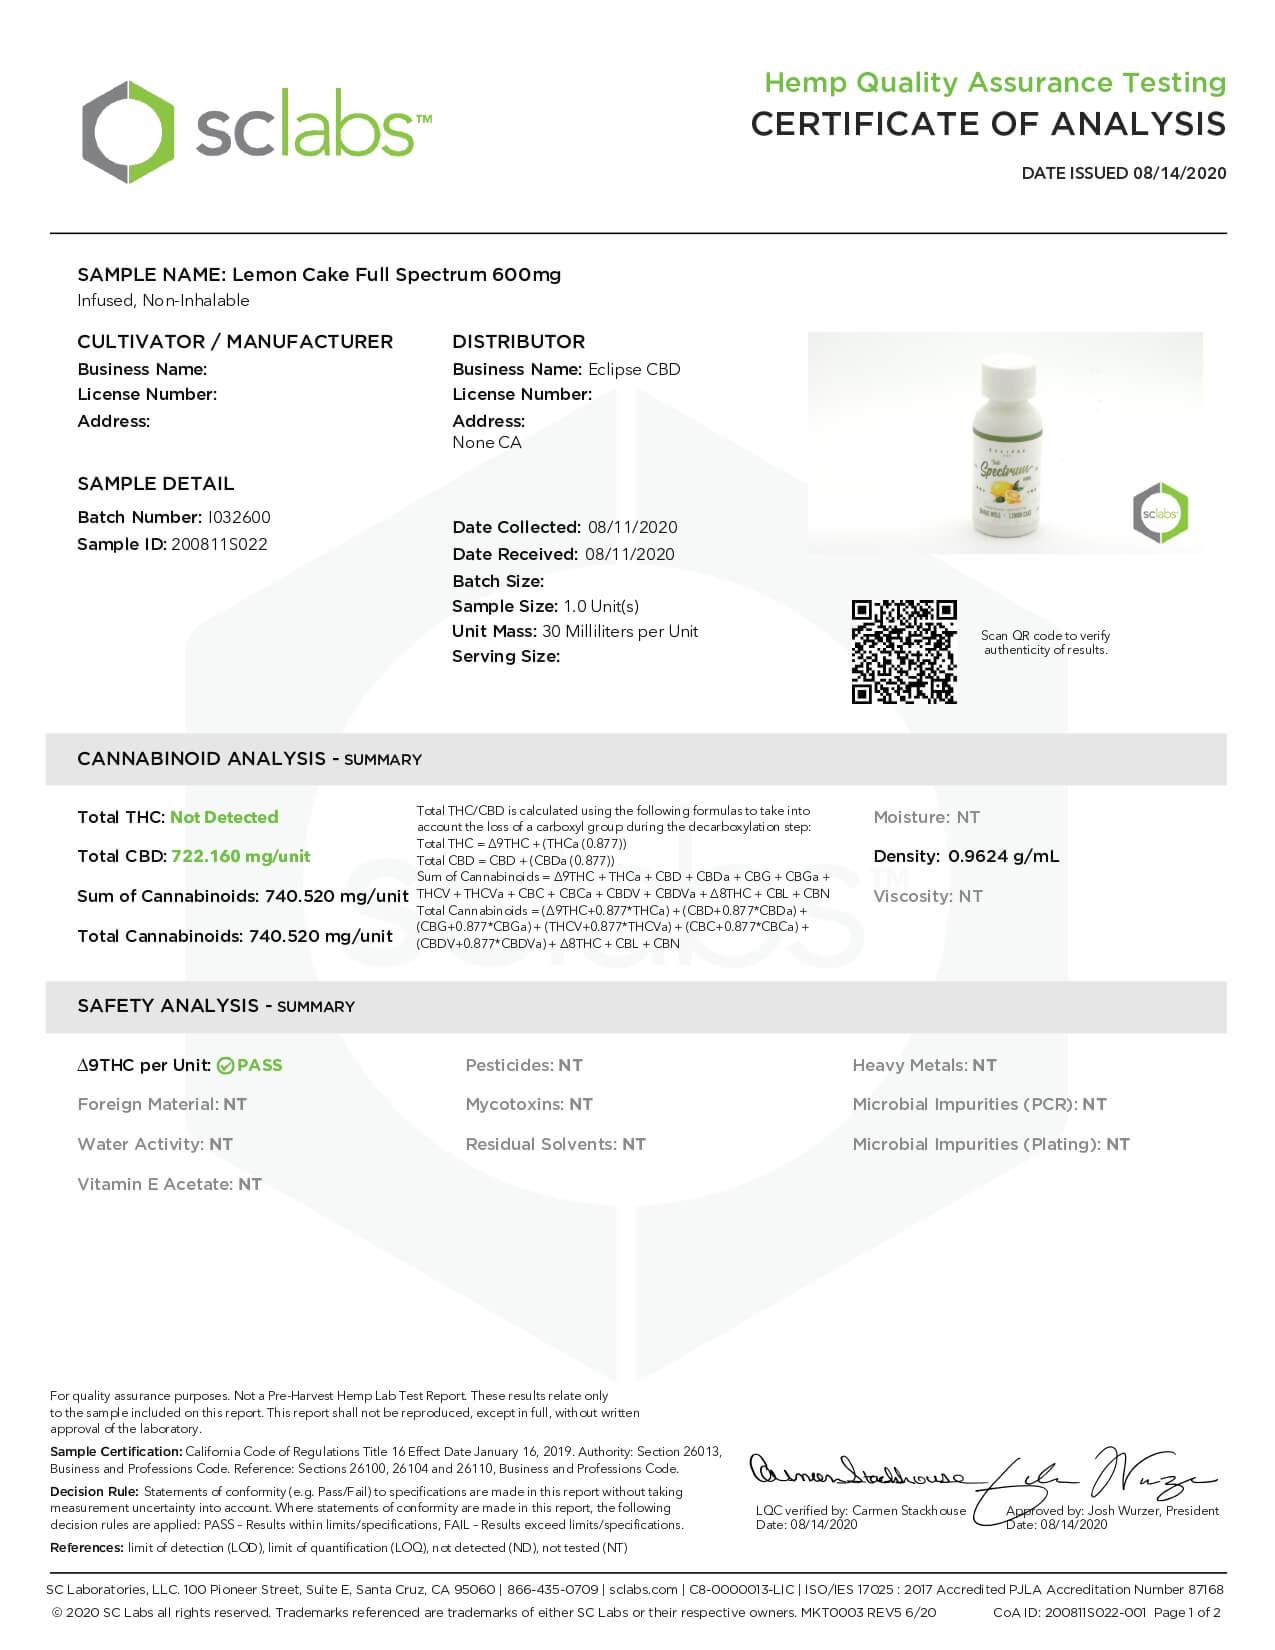 Eclipse CBD MCT Tincture Lemon Cake 600mg Lab Report